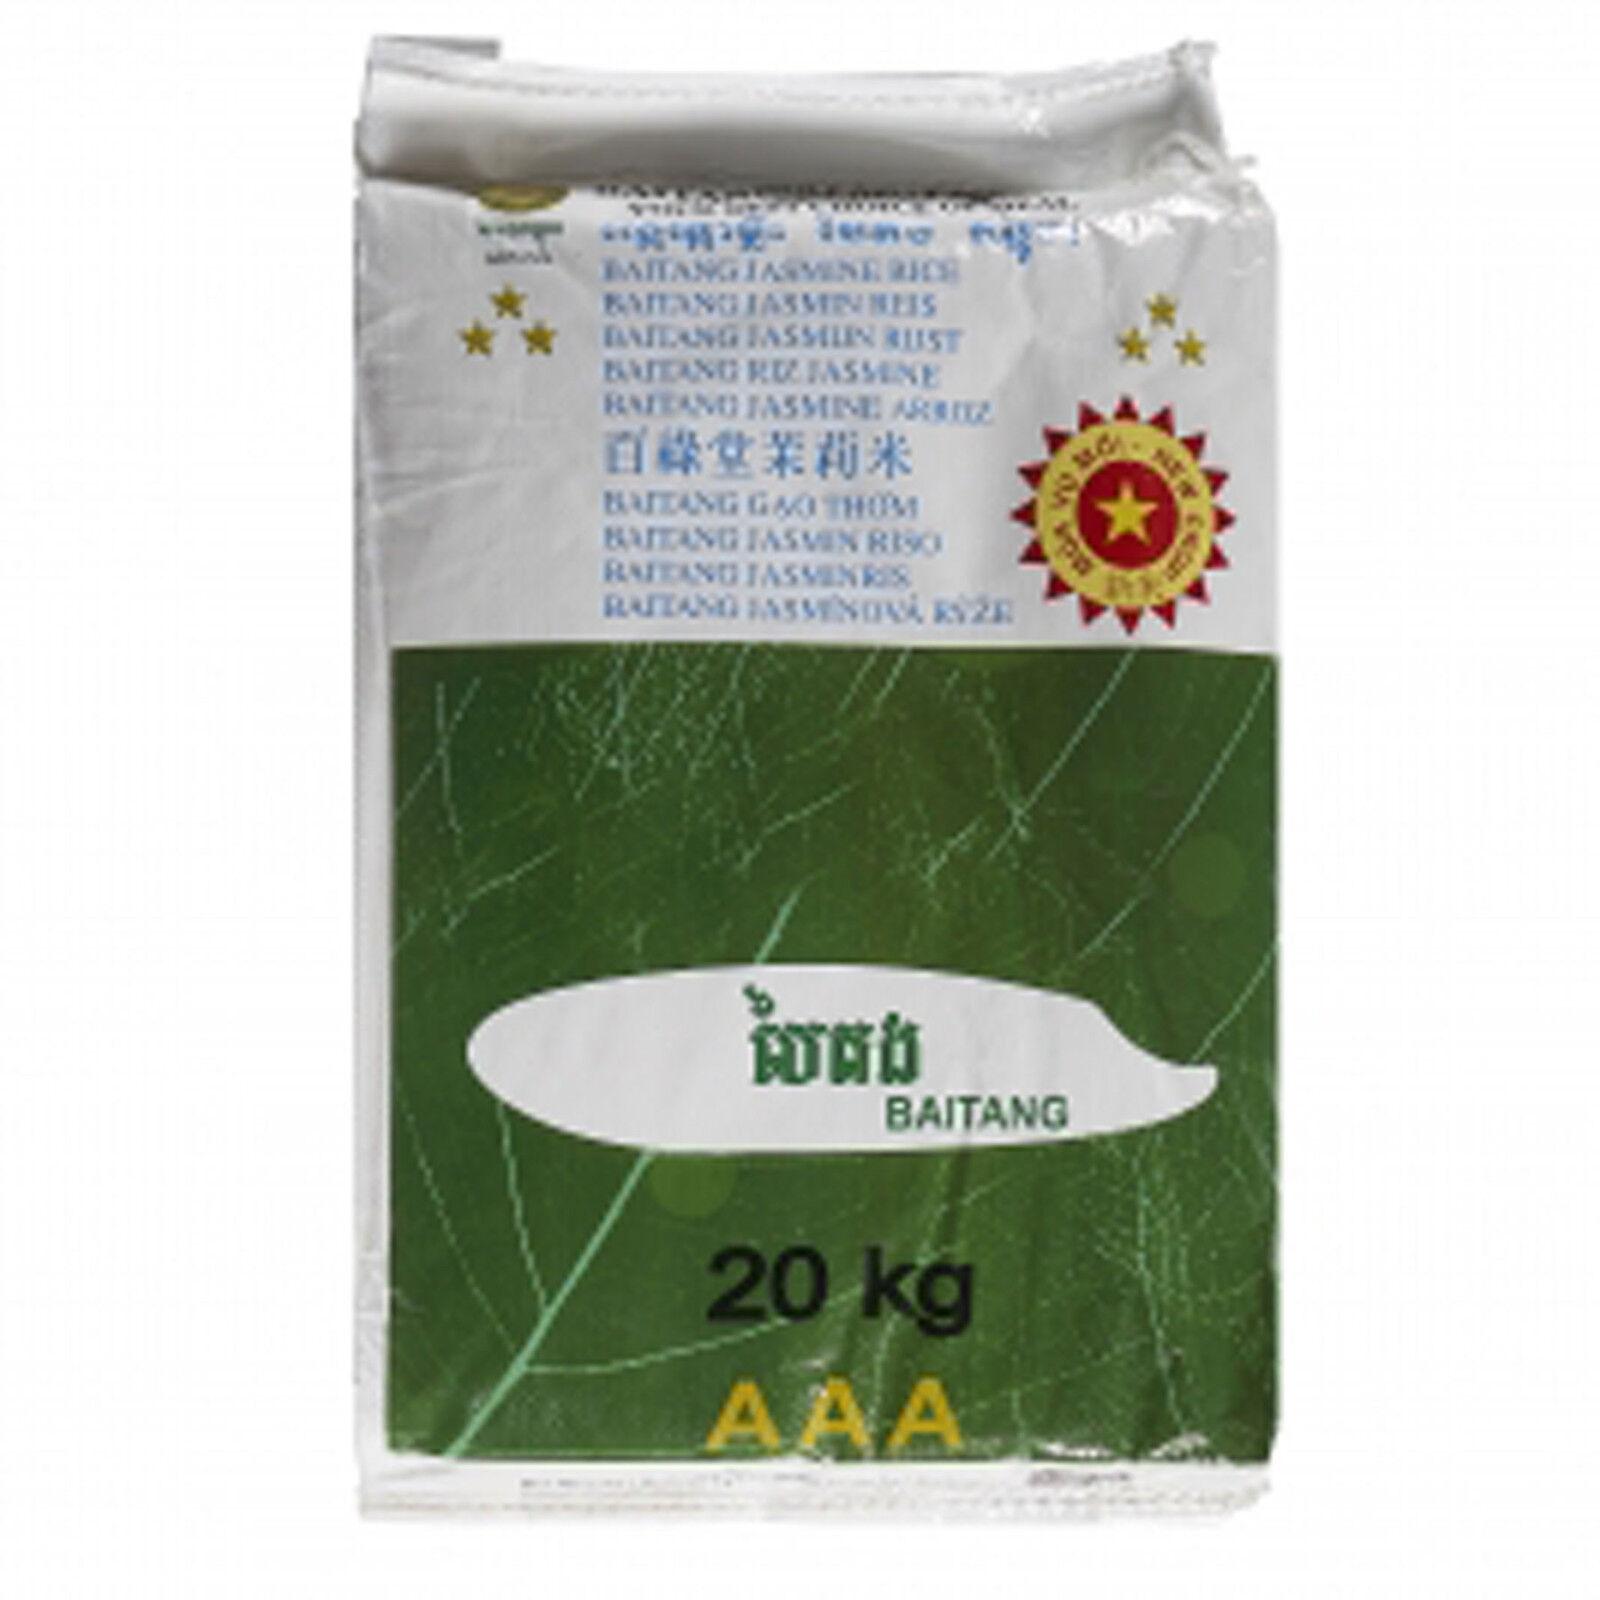 Duftreis 20kg Baitang Jasminreis Premium Qualität AAA Reis Jasmin Reis New Corp